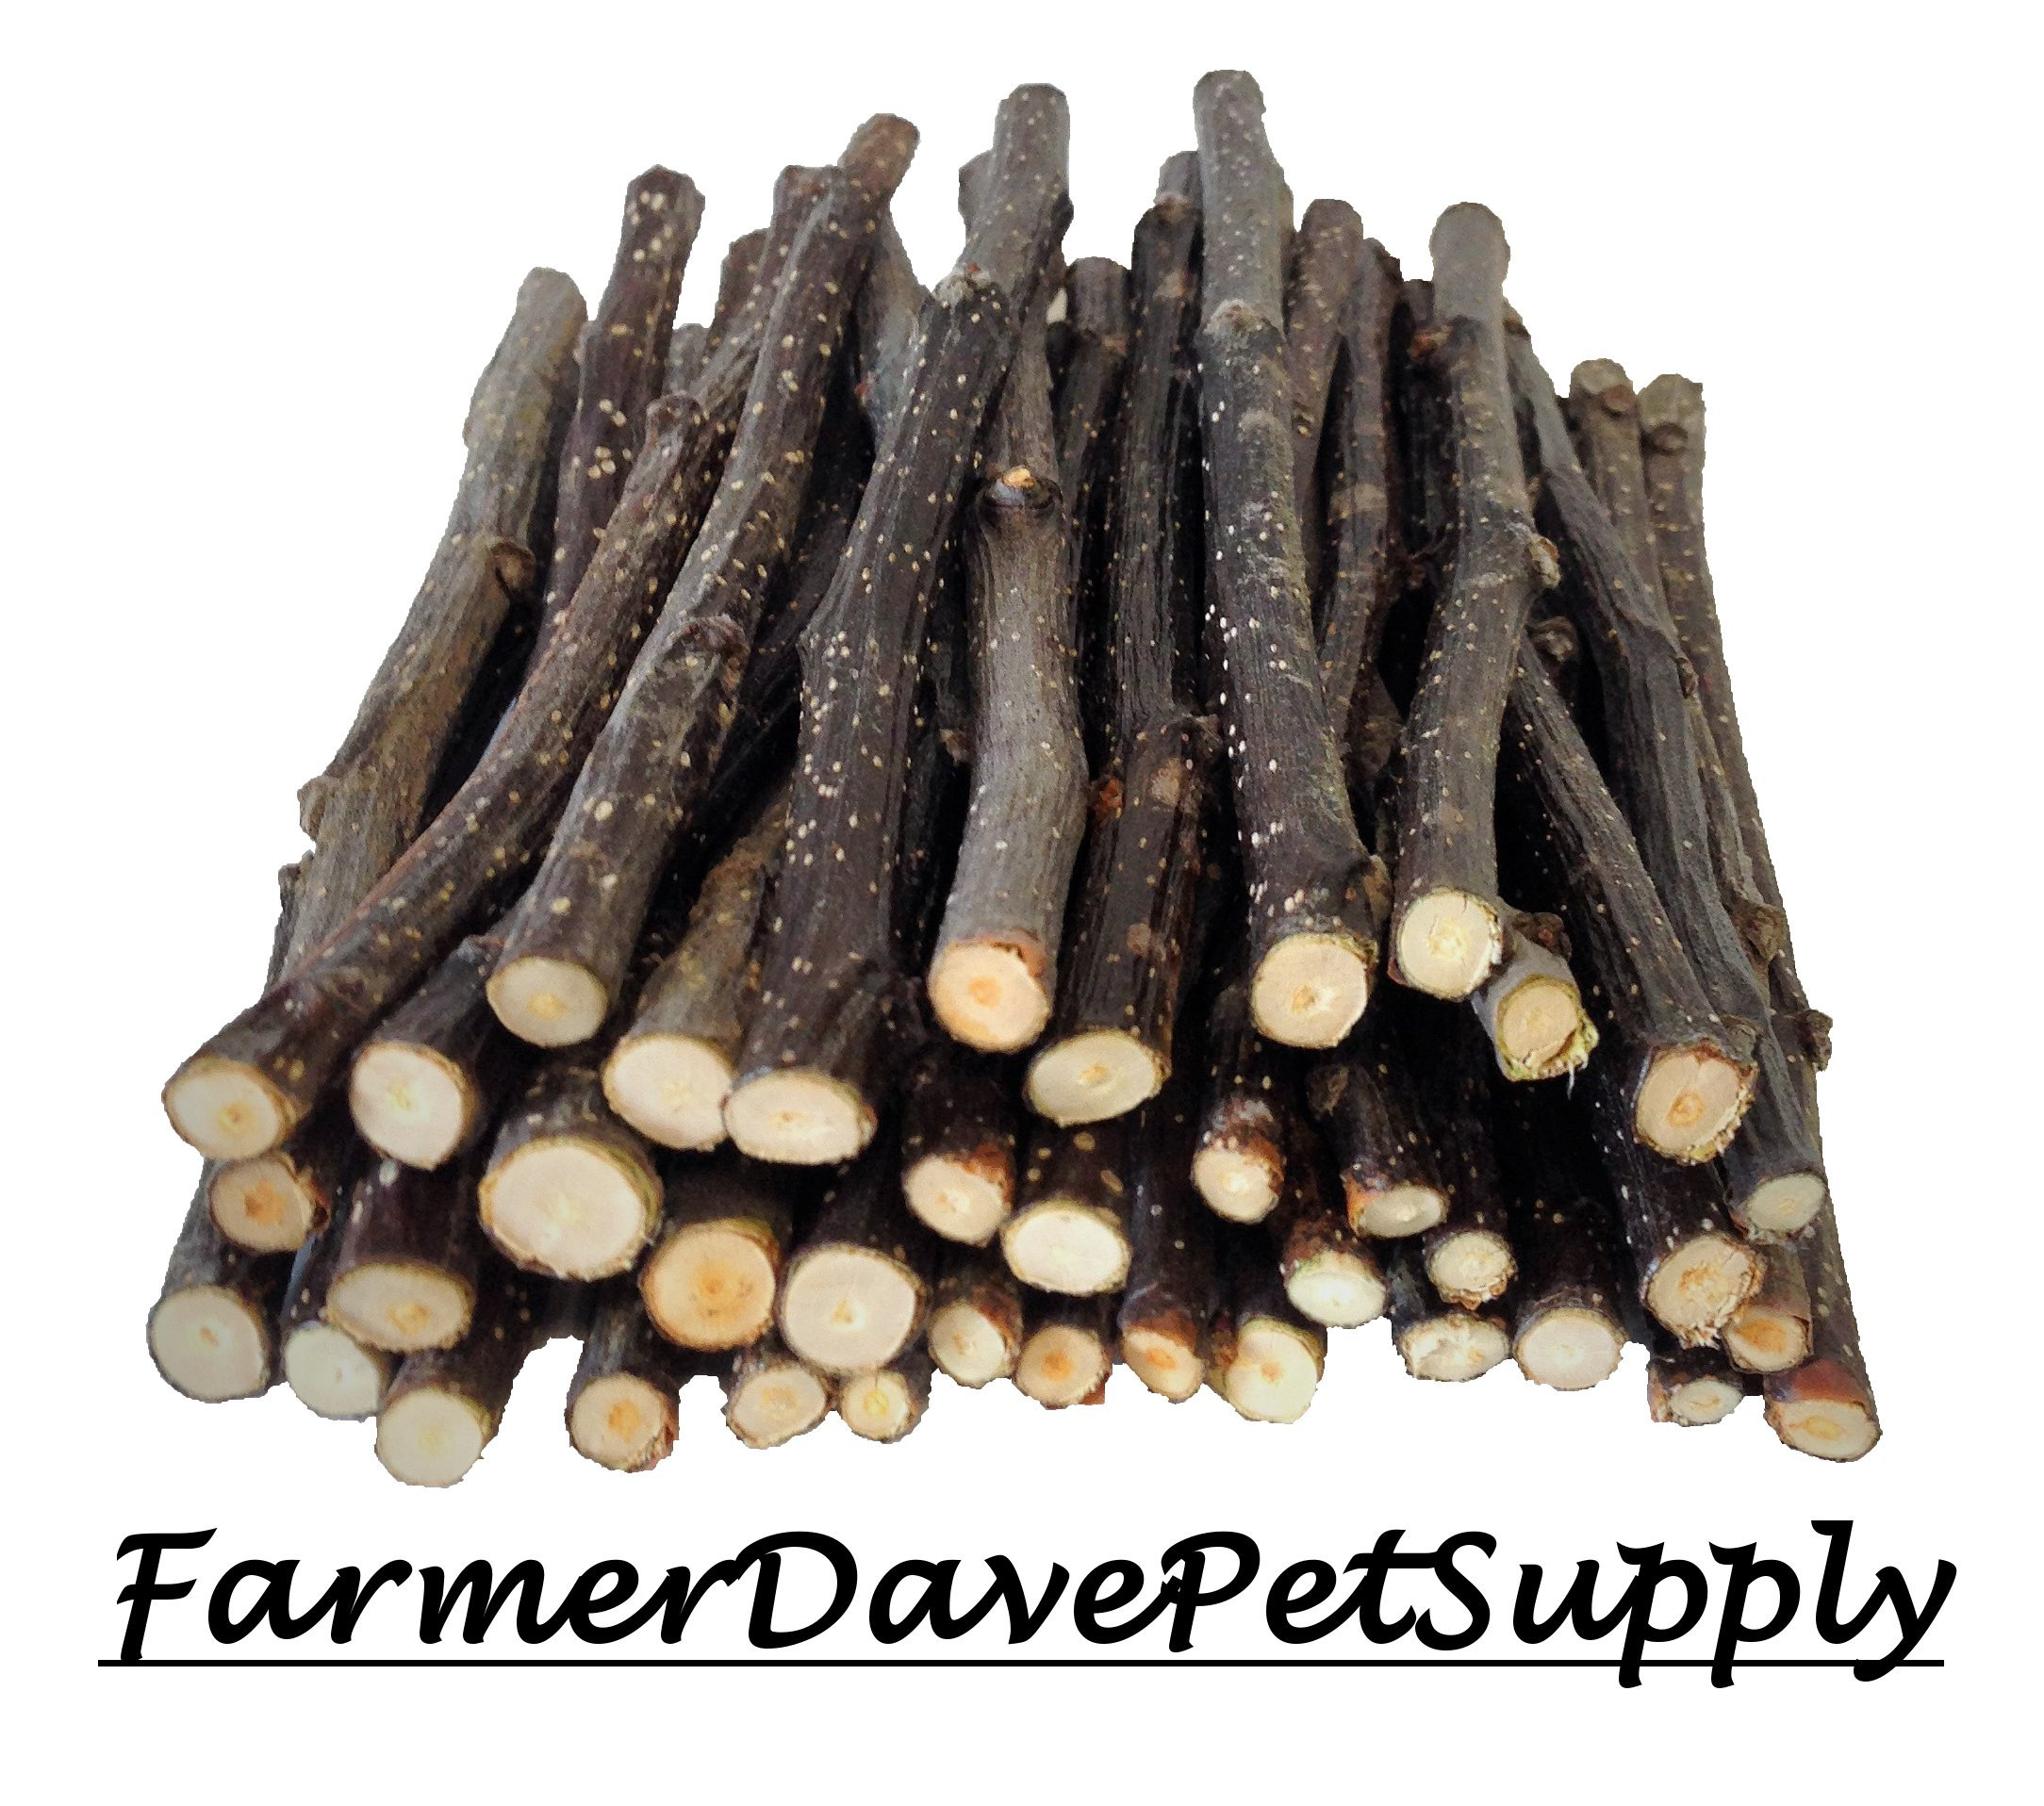 FarmerDavePetSupply 40 Apple Thin CHEW Sticks for Small Animals by FarmerDavePetSupply